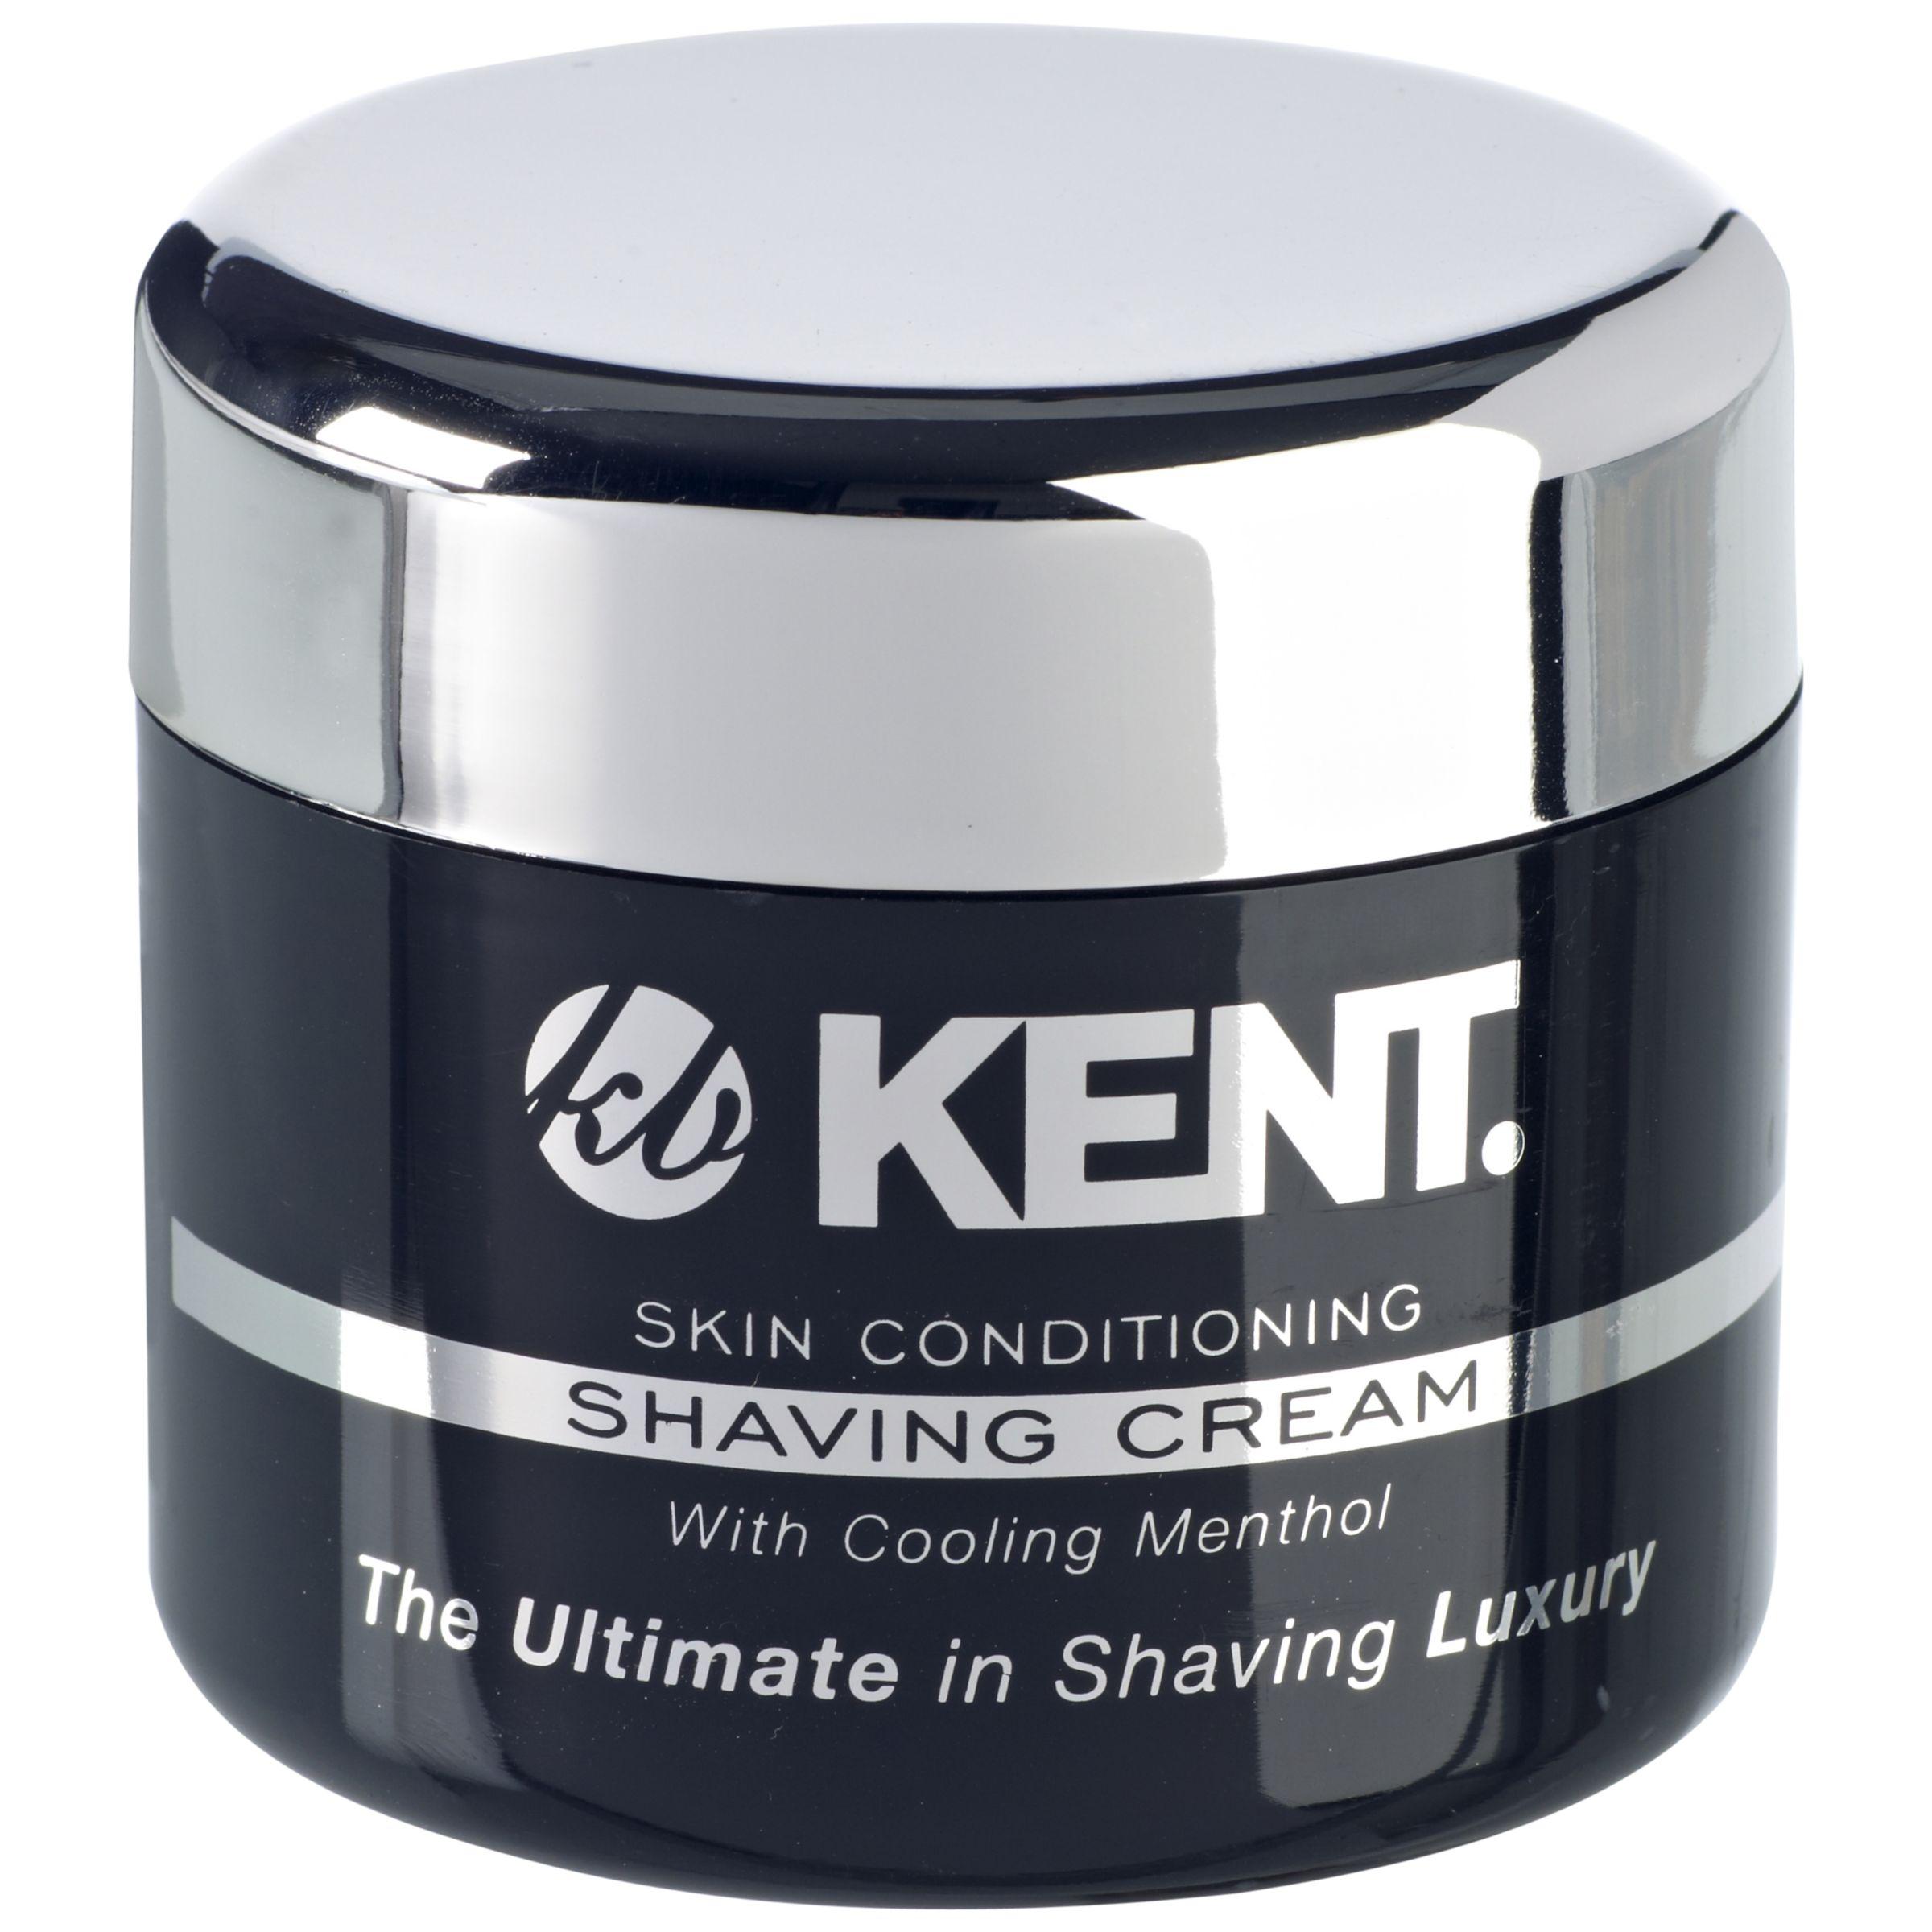 Kent Kent SCT2 Men's Shaving Cream Tub, 125ml